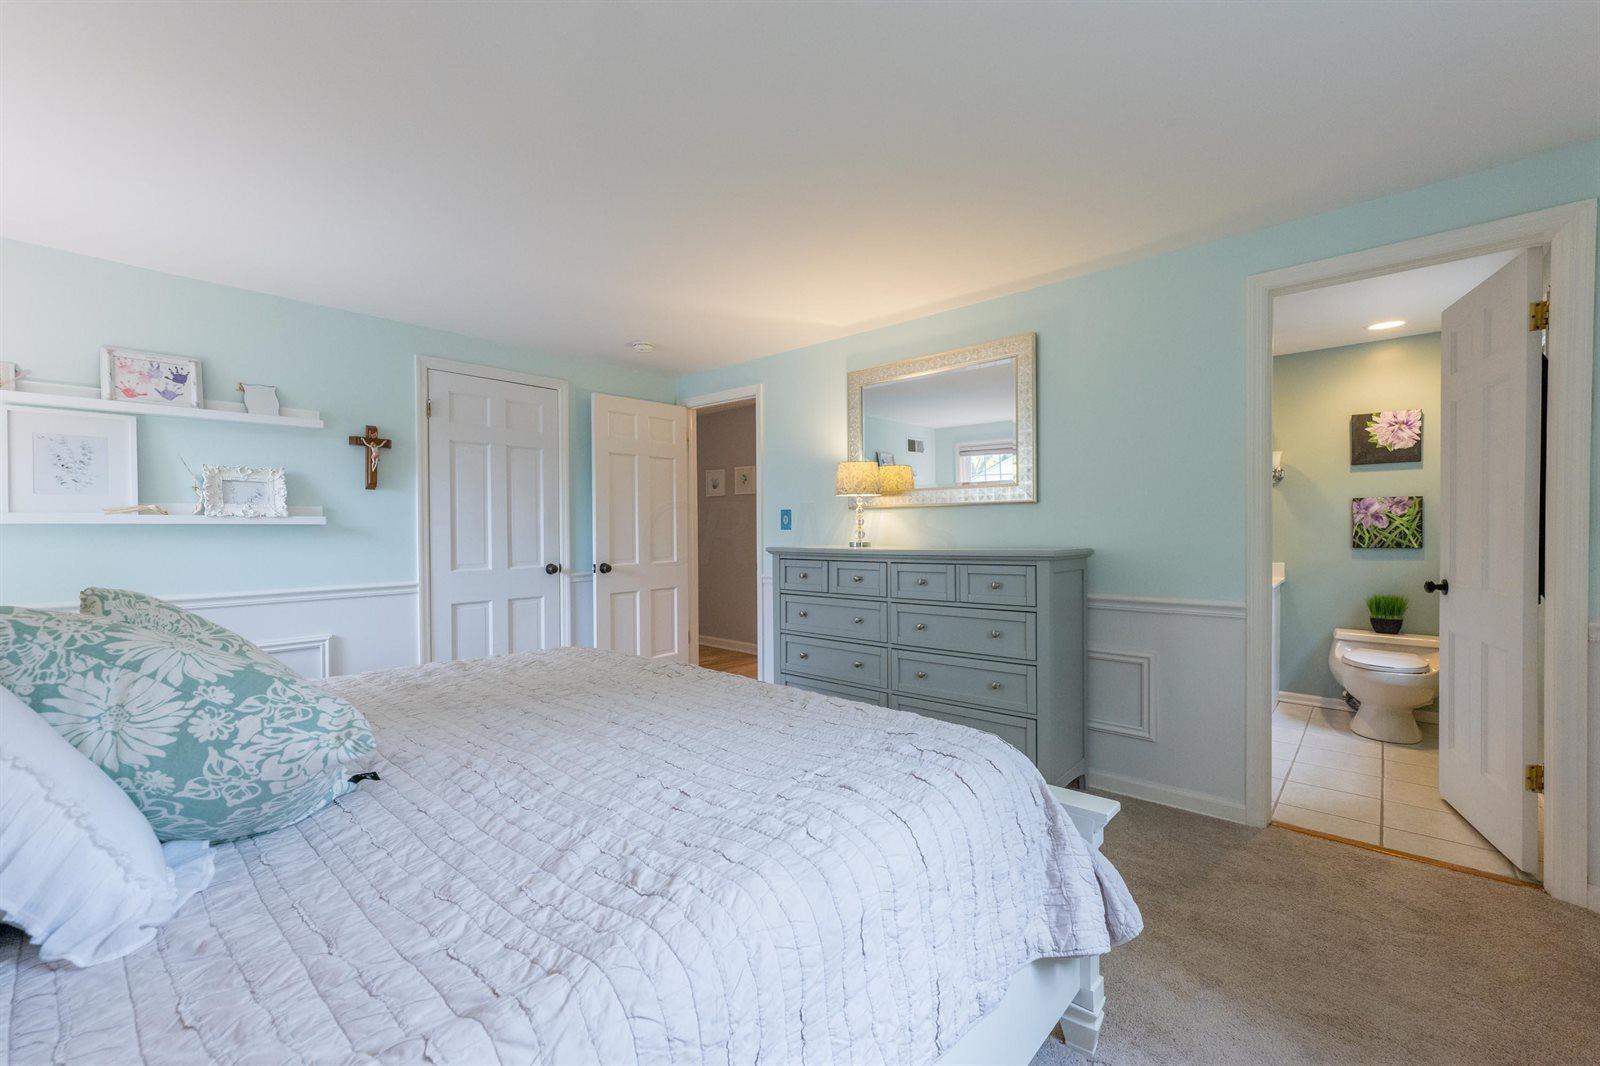 1130 Kingsdale Terrace, Upper Arlington, OH 43220